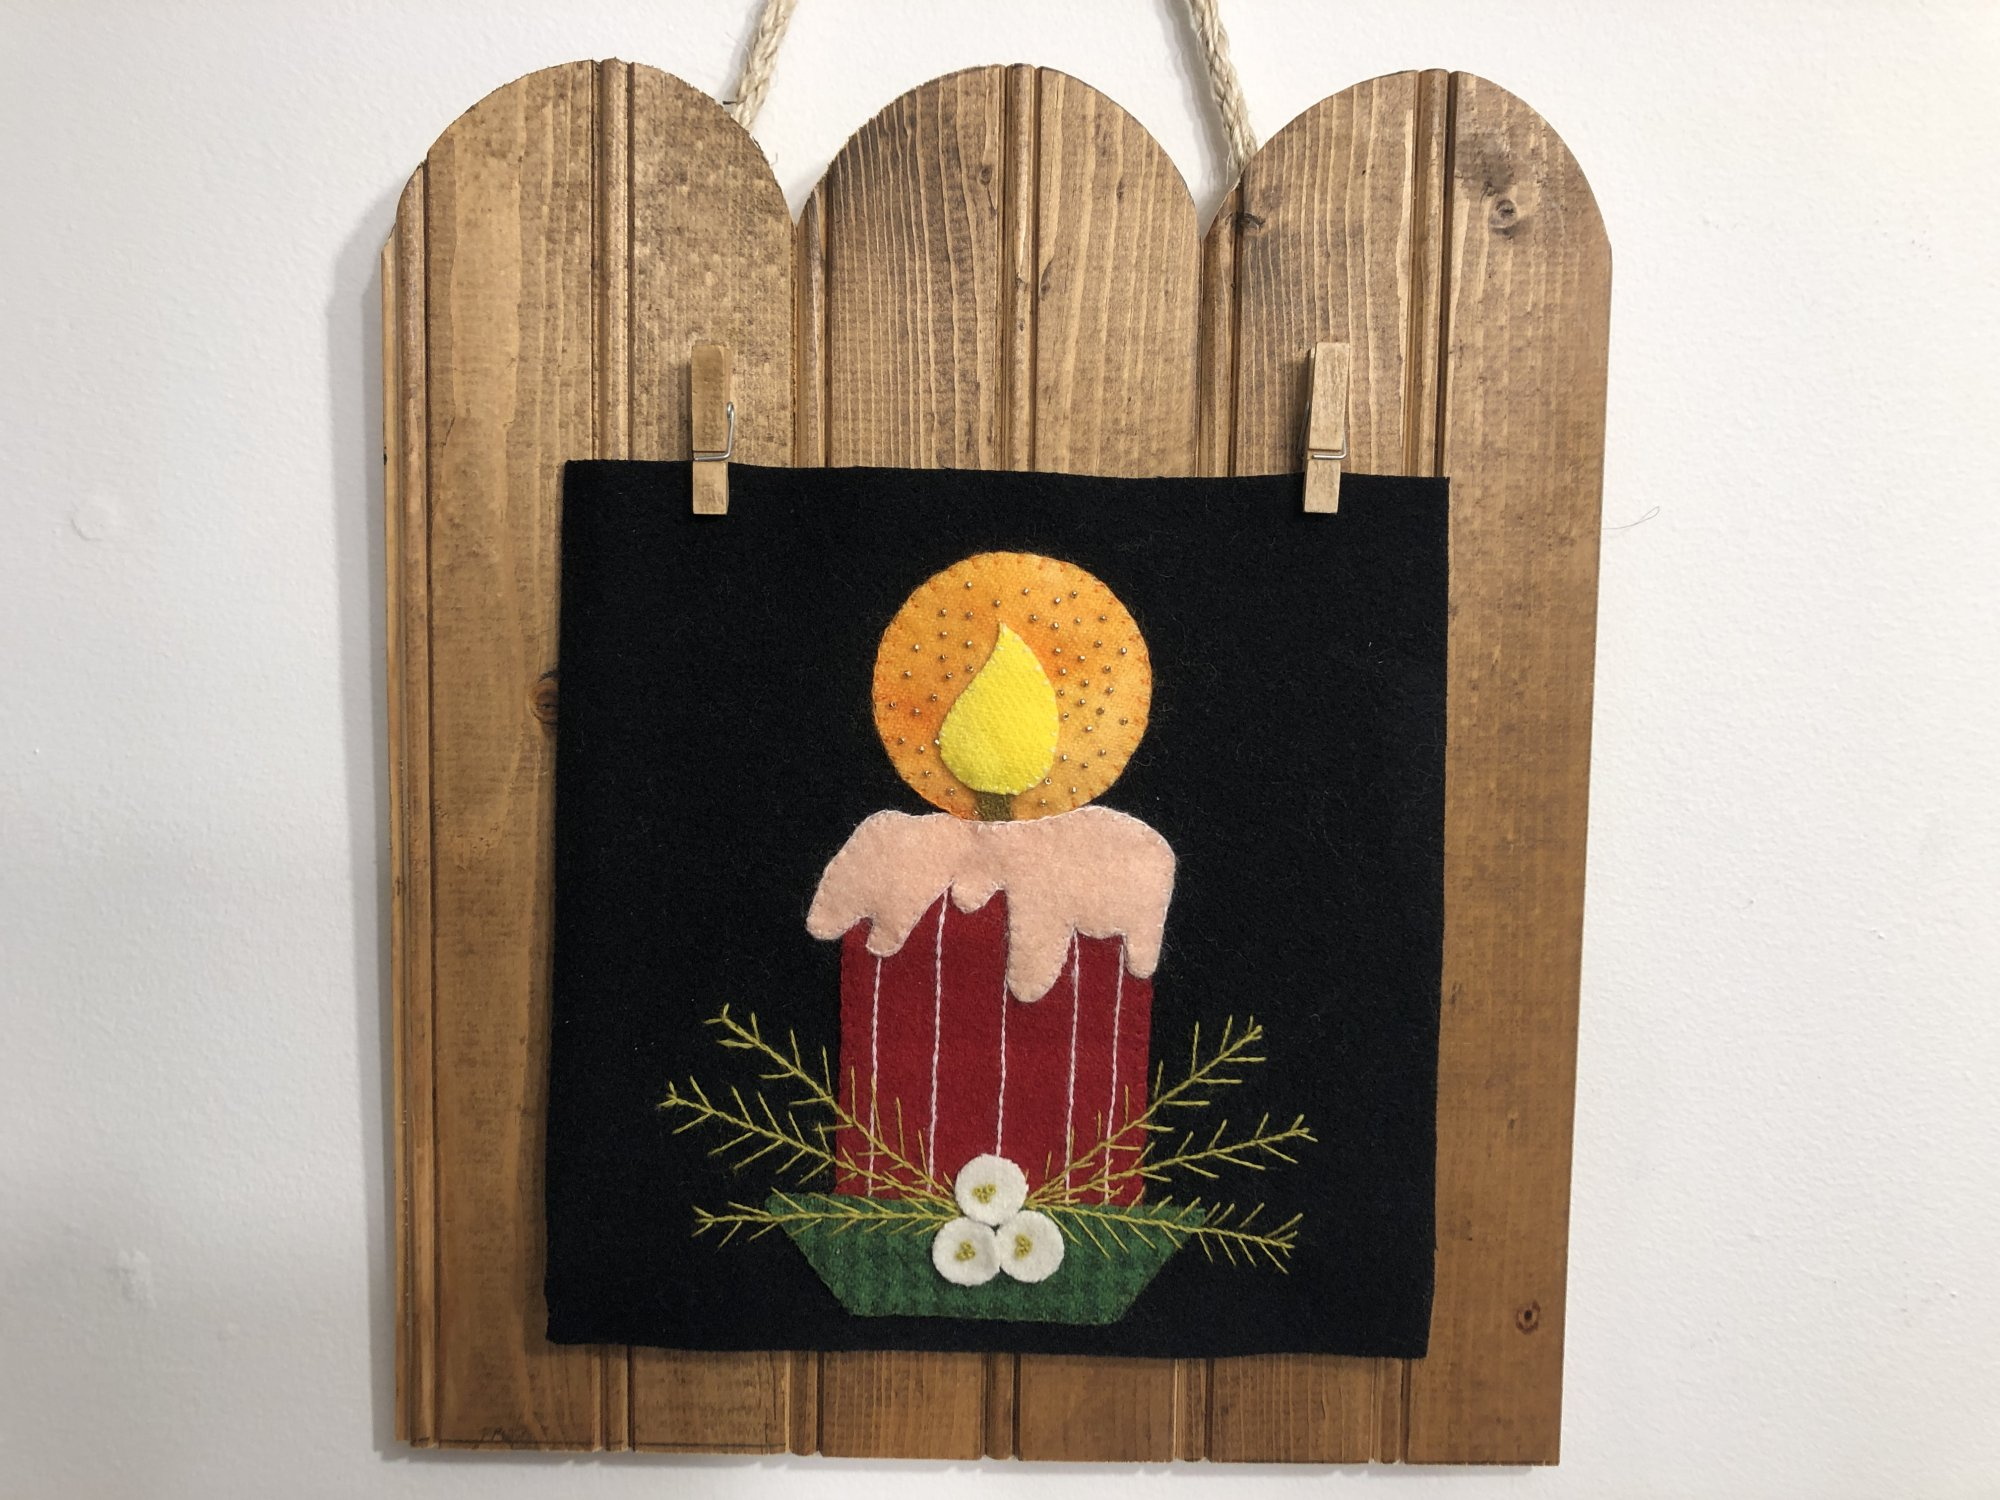 Holiday Glow Chrismas Candle pattern